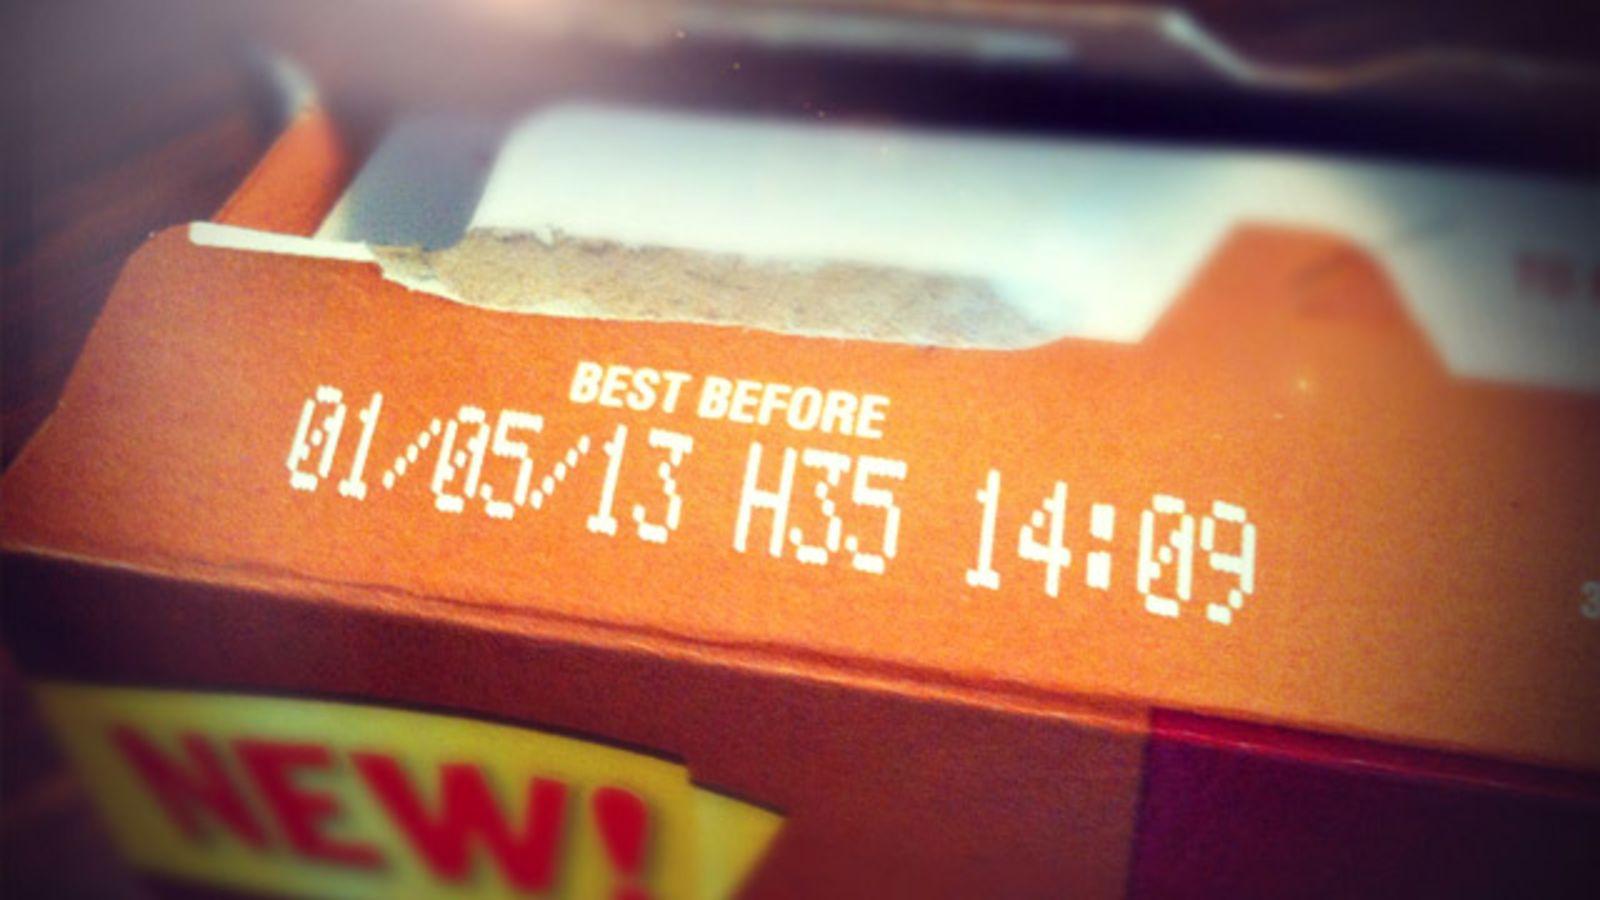 expired foods